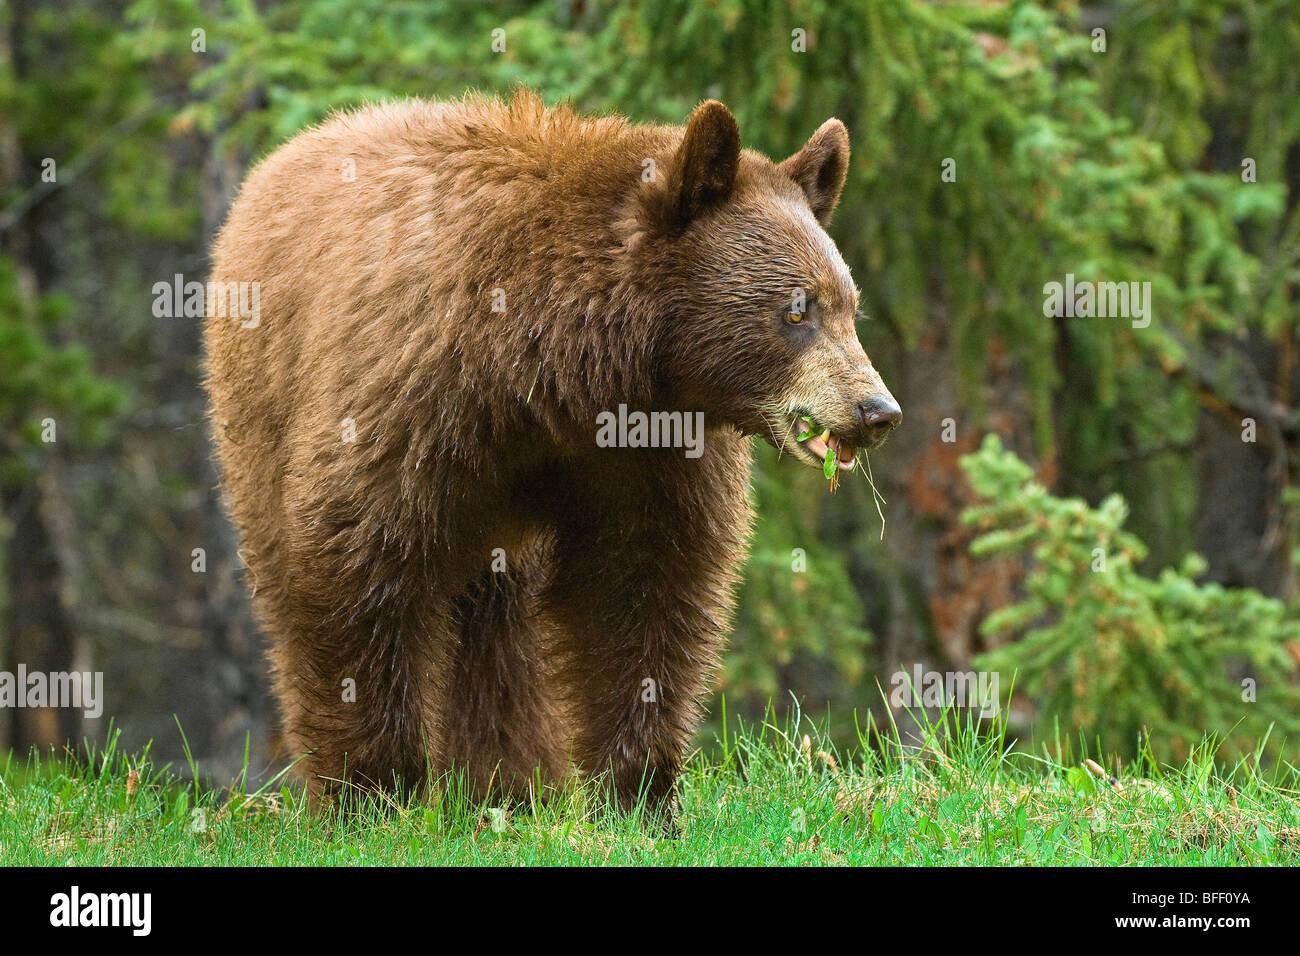 Cinnamon-coloured American black bear (Ursus americanus) grazing on roadside grasses and horestails Rocky Mountains - Stock Image